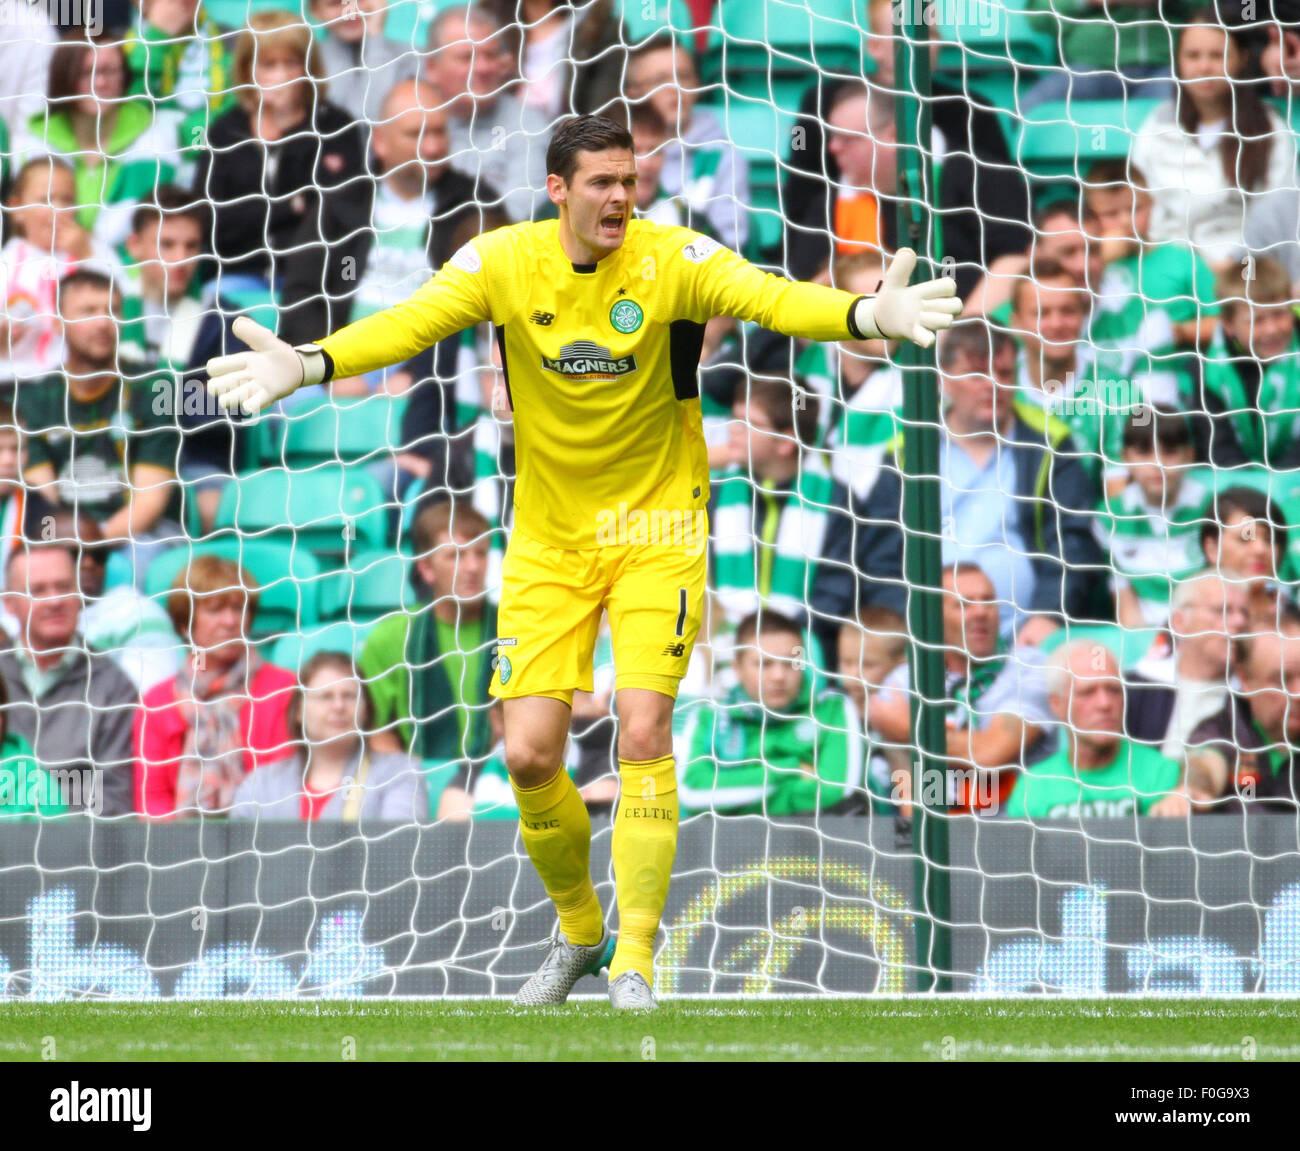 Glasgow, Scotland. 15th Aug, 2015. Scottish Premiership. Celtic versus Inverness CT. Craig Gordon pushes his defence - Stock Image